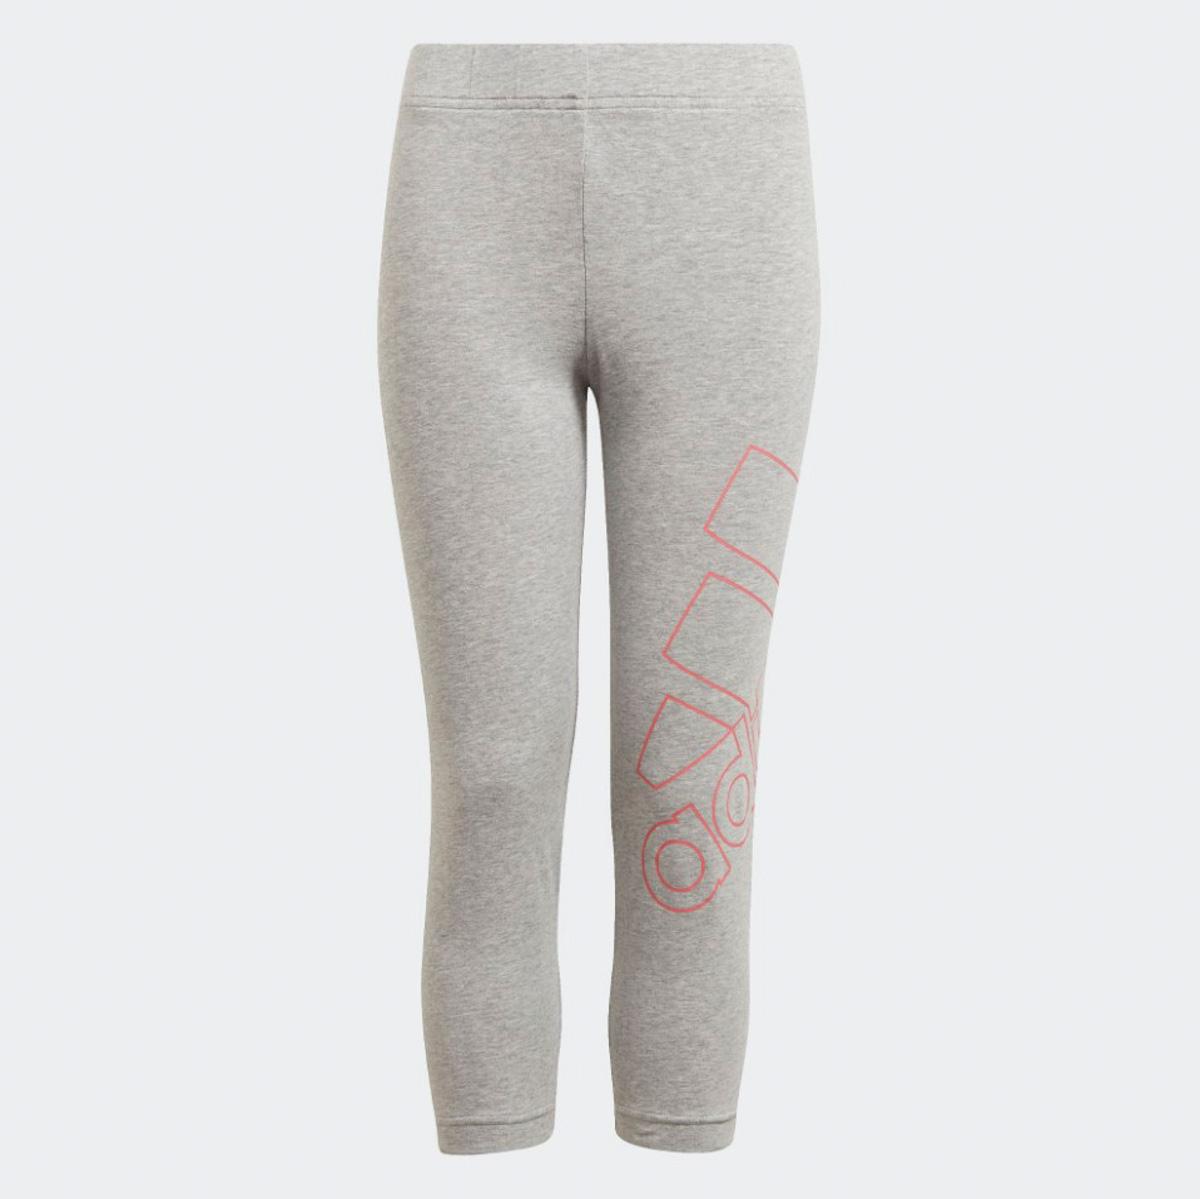 Adidas Girl Logo 7/8 Leggings